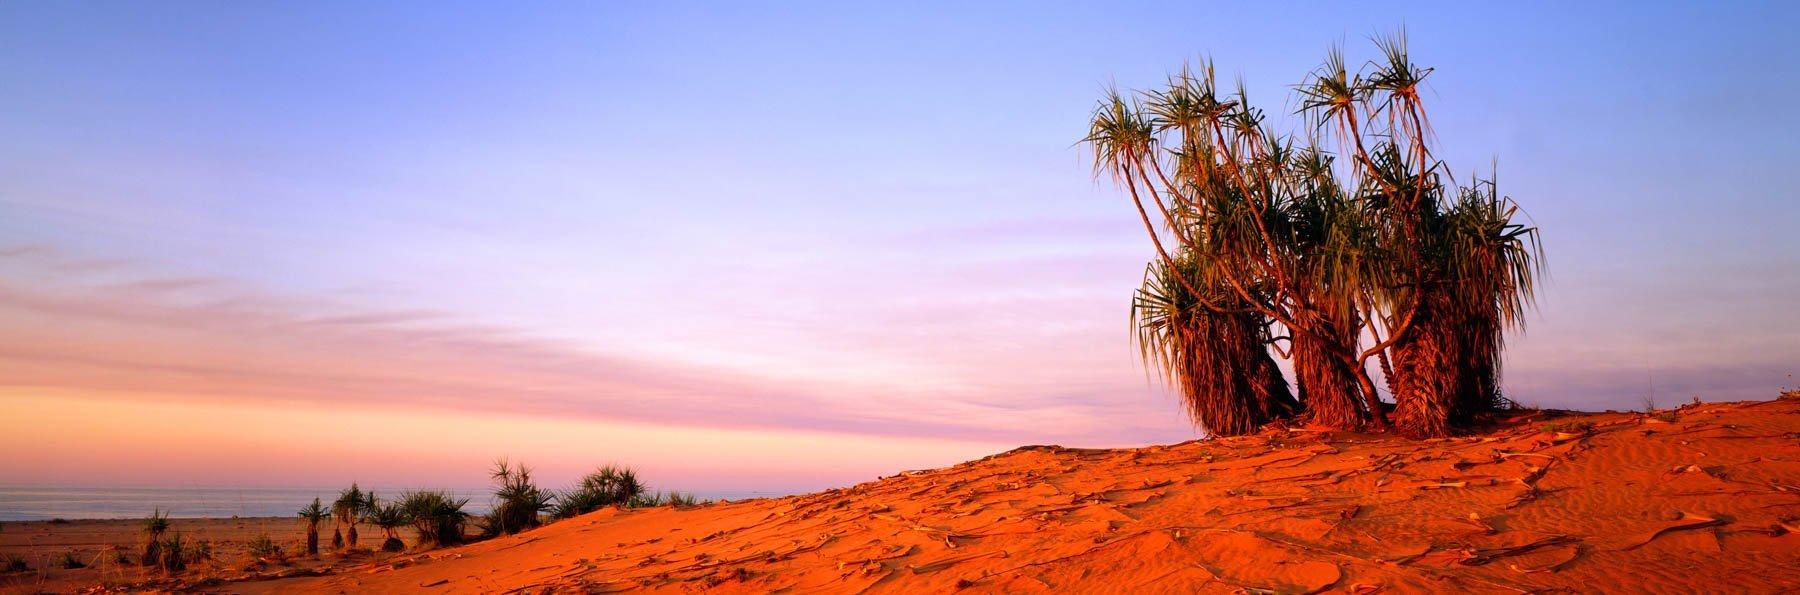 Pandanus palms standing like sentinels on red sand dunes at Cape Leveque, Kimberleys, WA, Australia.